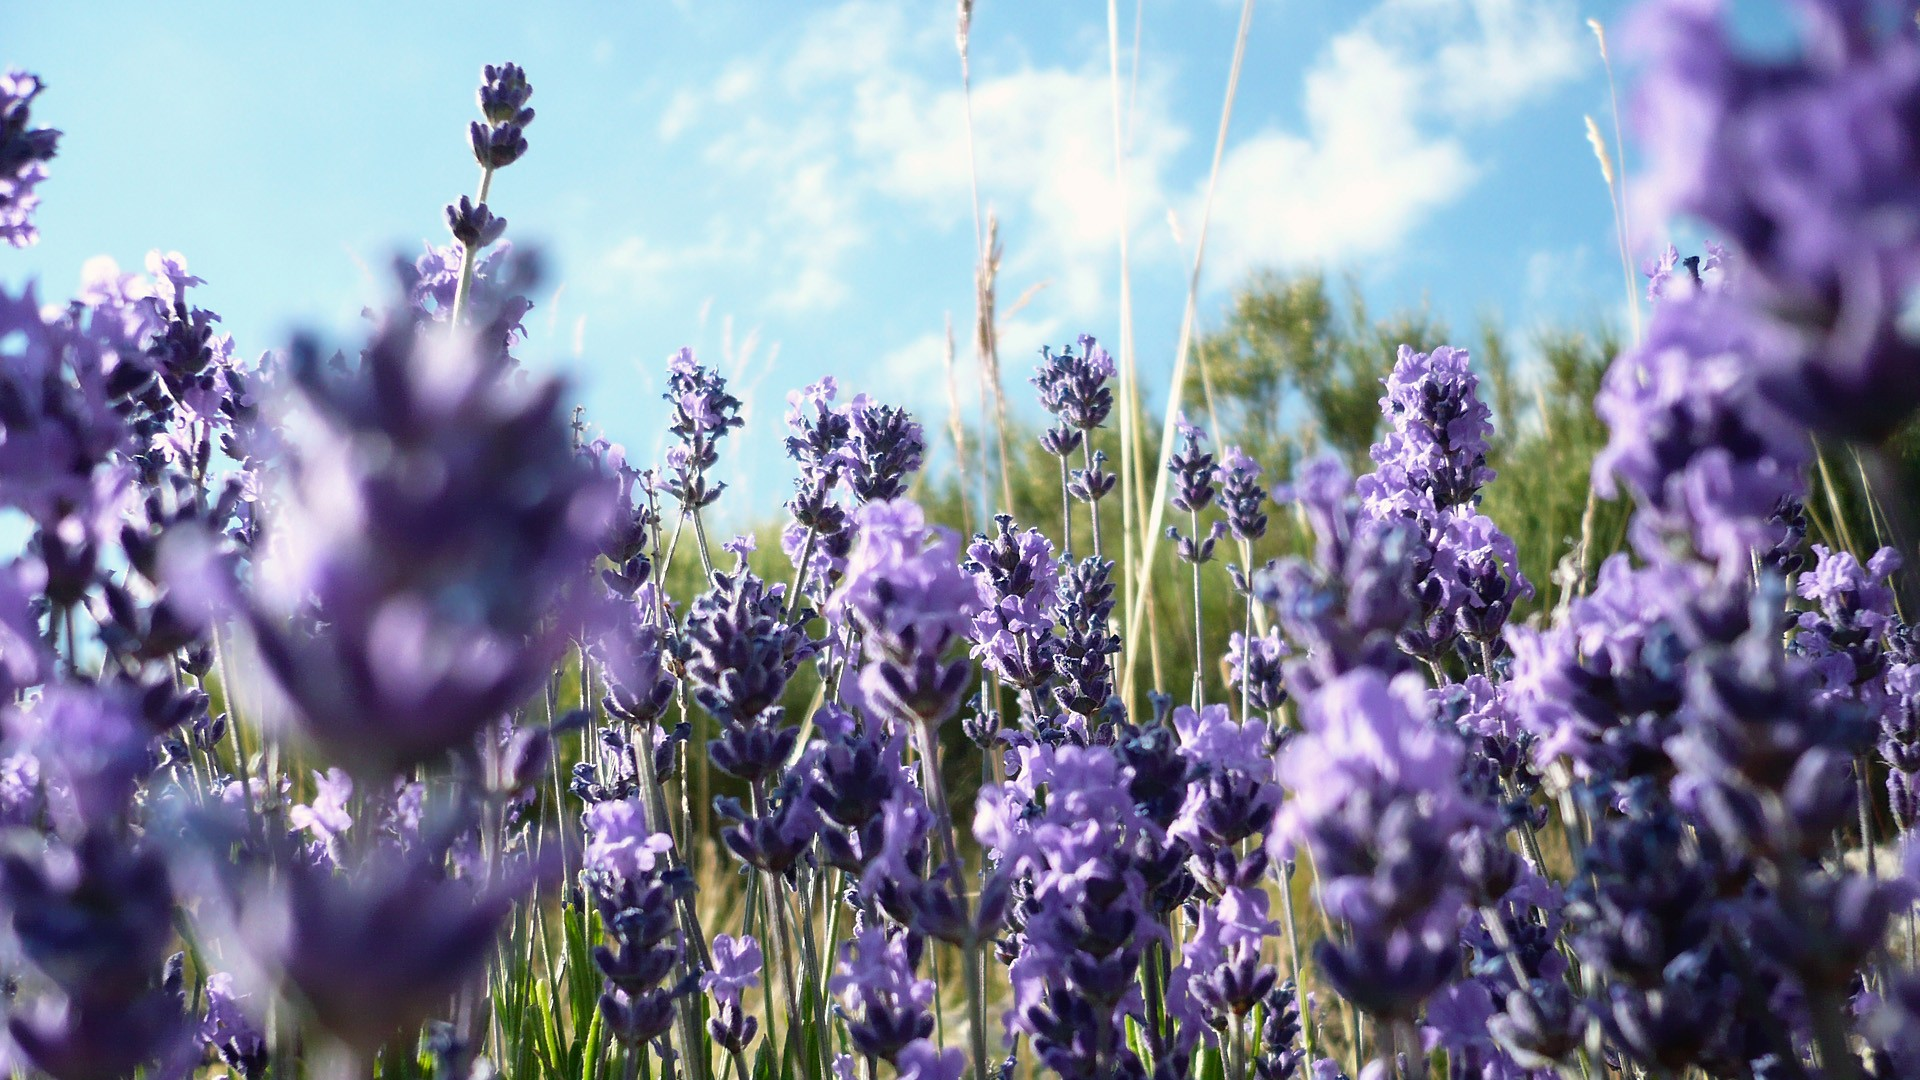 lavender background wallpaper - HD1920×1080